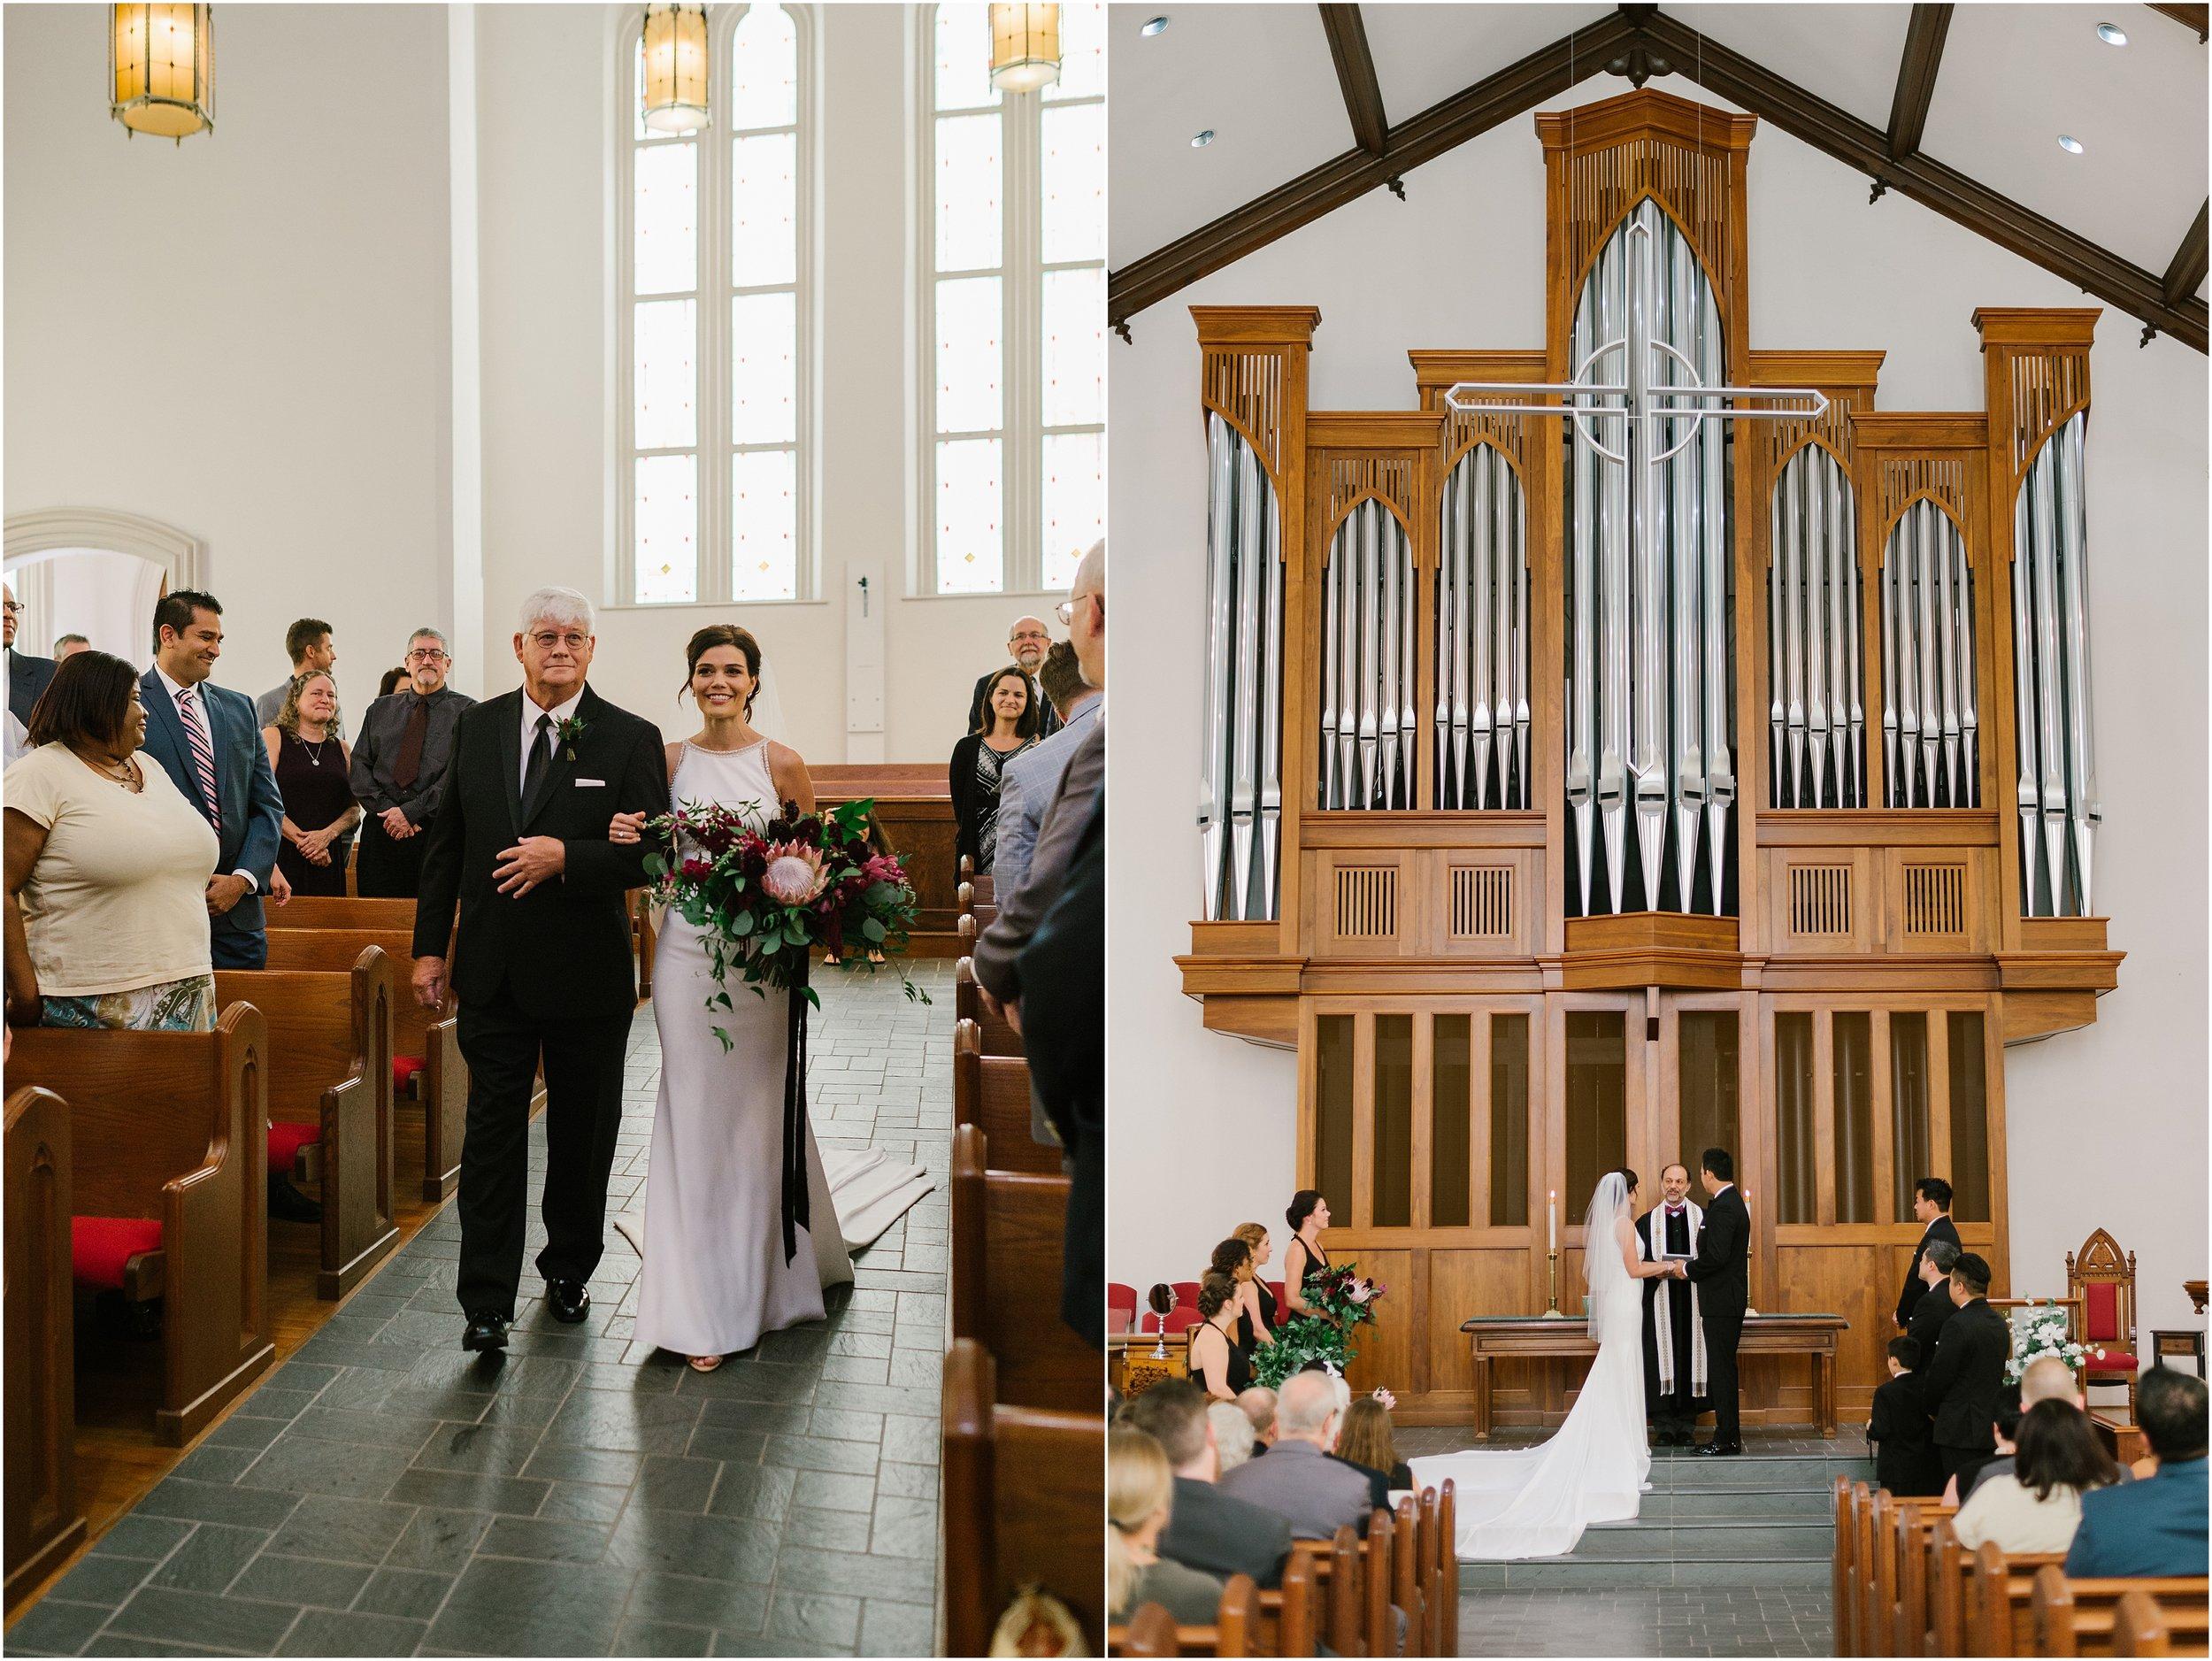 Rebecca_Shehorn_Photography_Indianapolis Wedding Photographer Sycamore at Mallow Run Wedding_9727.jpg